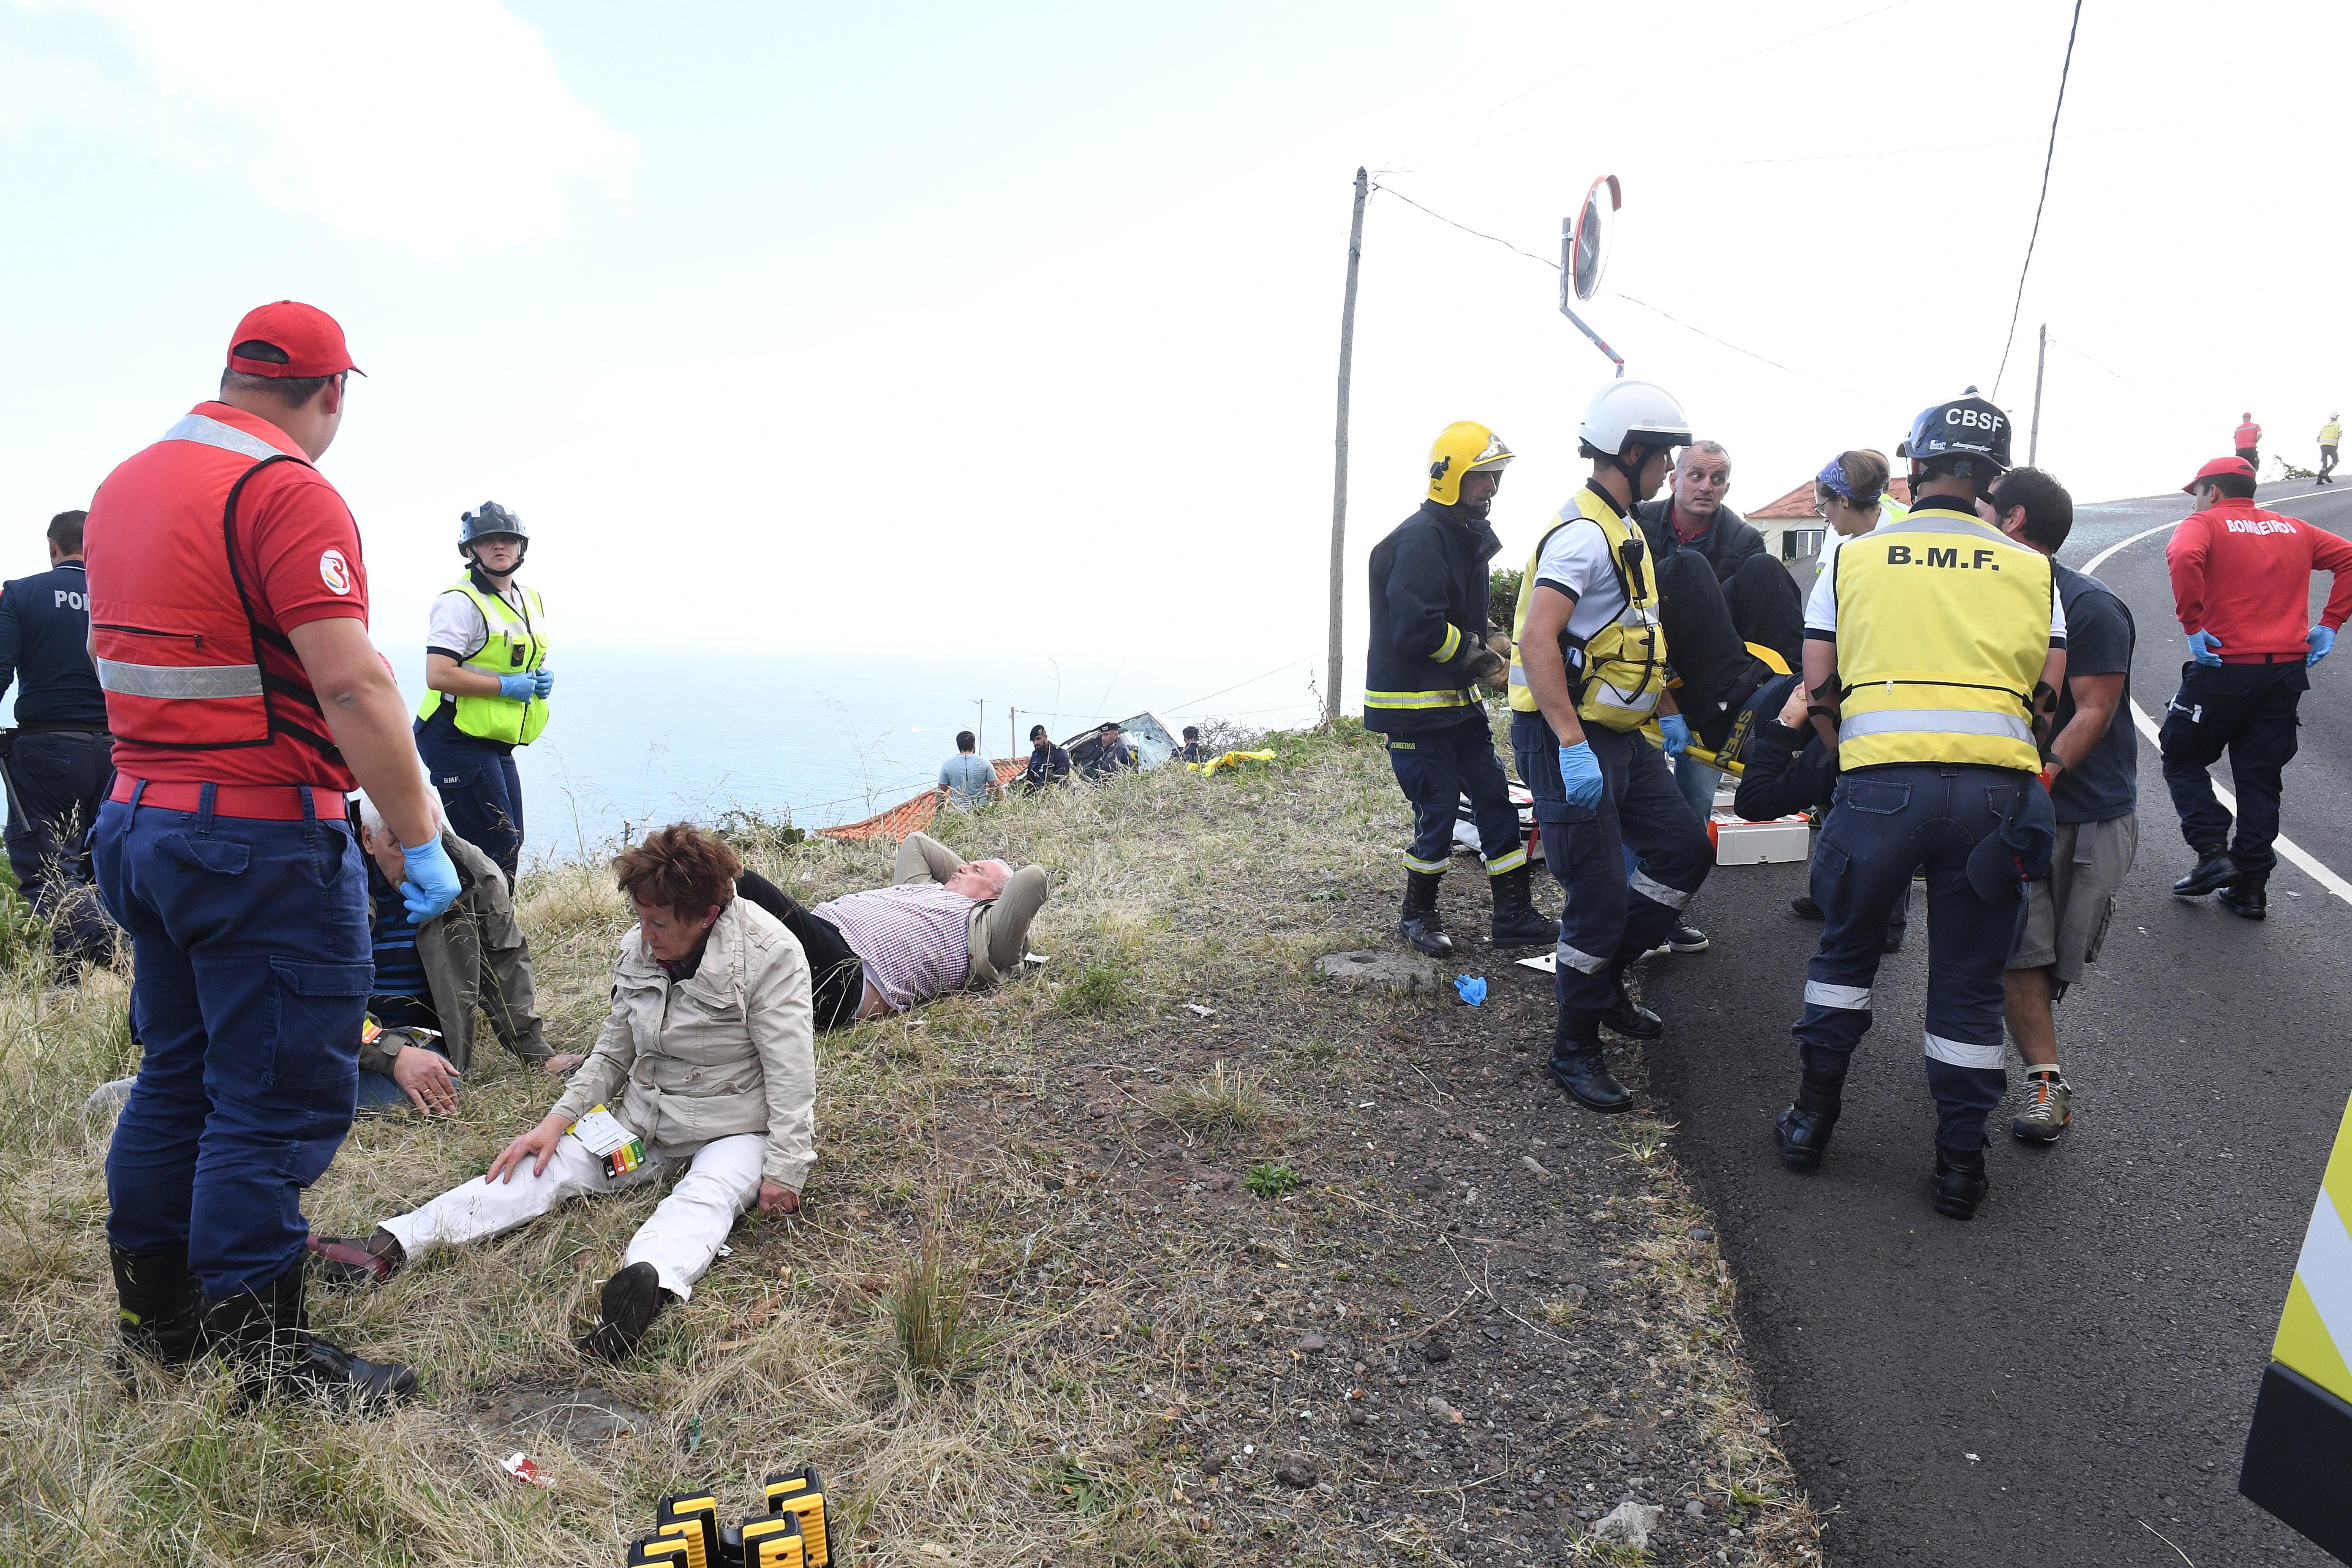 Madeira: Casal de turistas explica o que lhes poderá ter salvado a vida